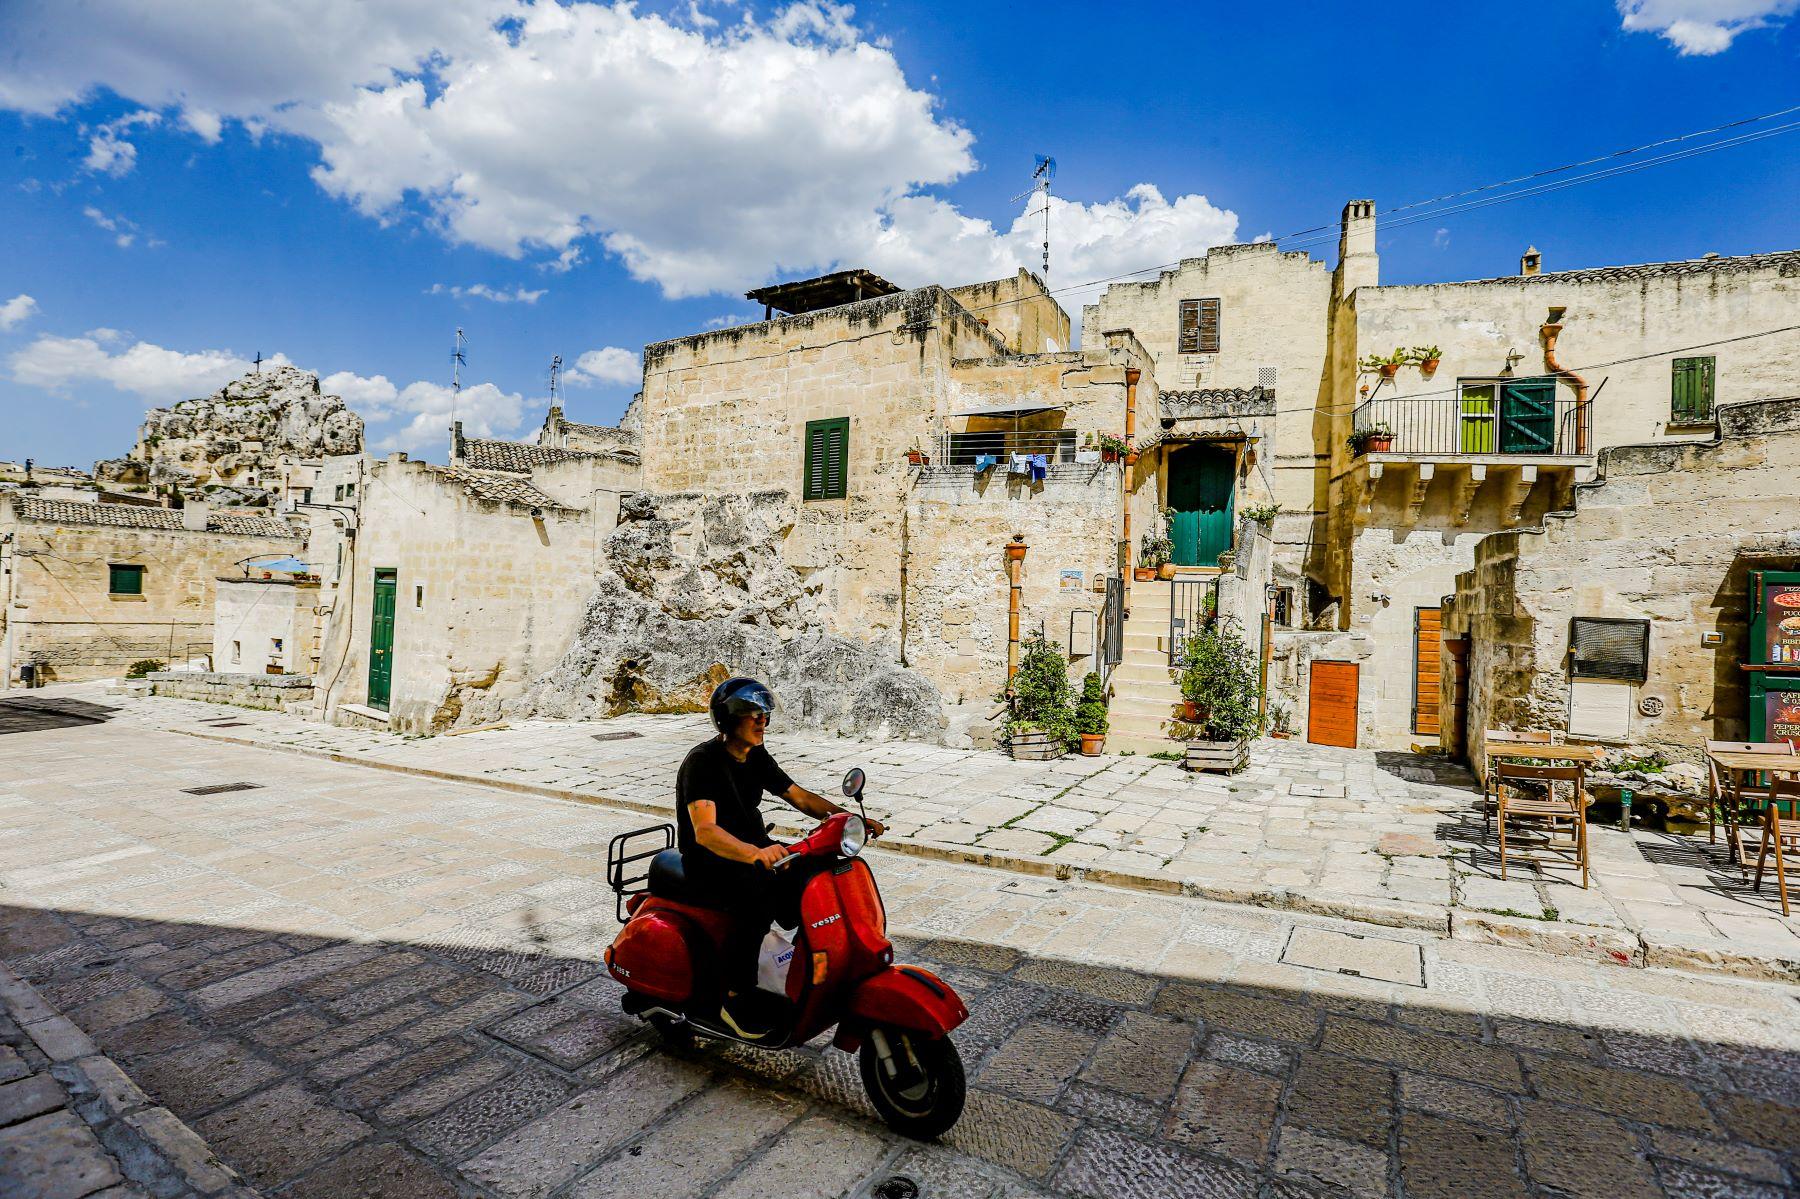 A man driving a Vespa scooter in Basilicata, Italy